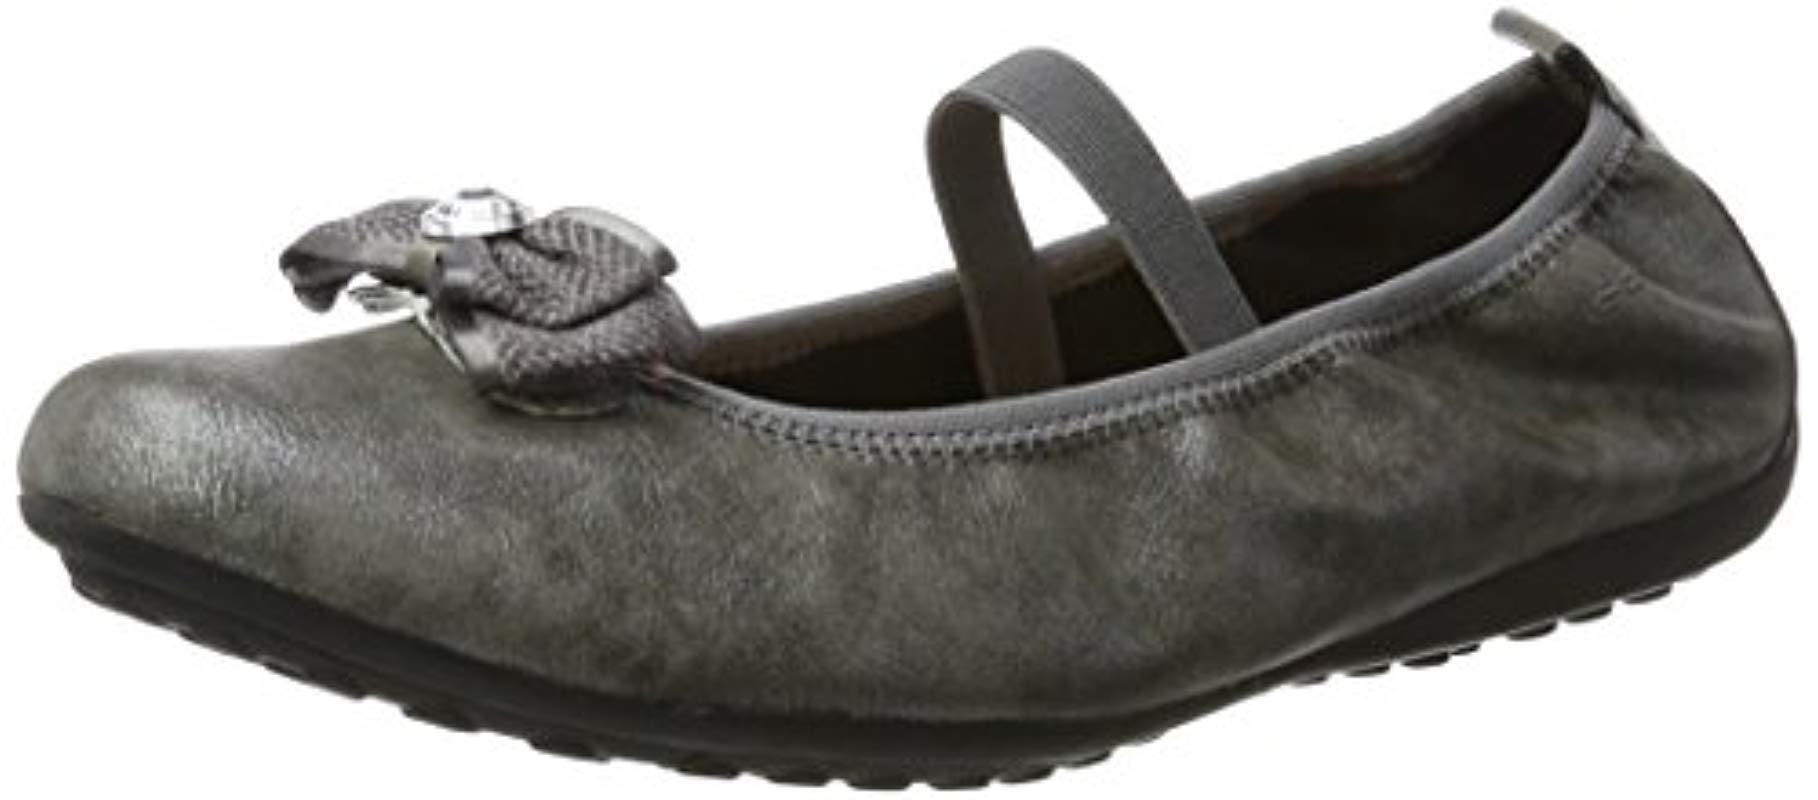 081df2870 Geox Unisex Adults  Jr Piuma Ballerine G Closed Toe Sandals in Gray ...